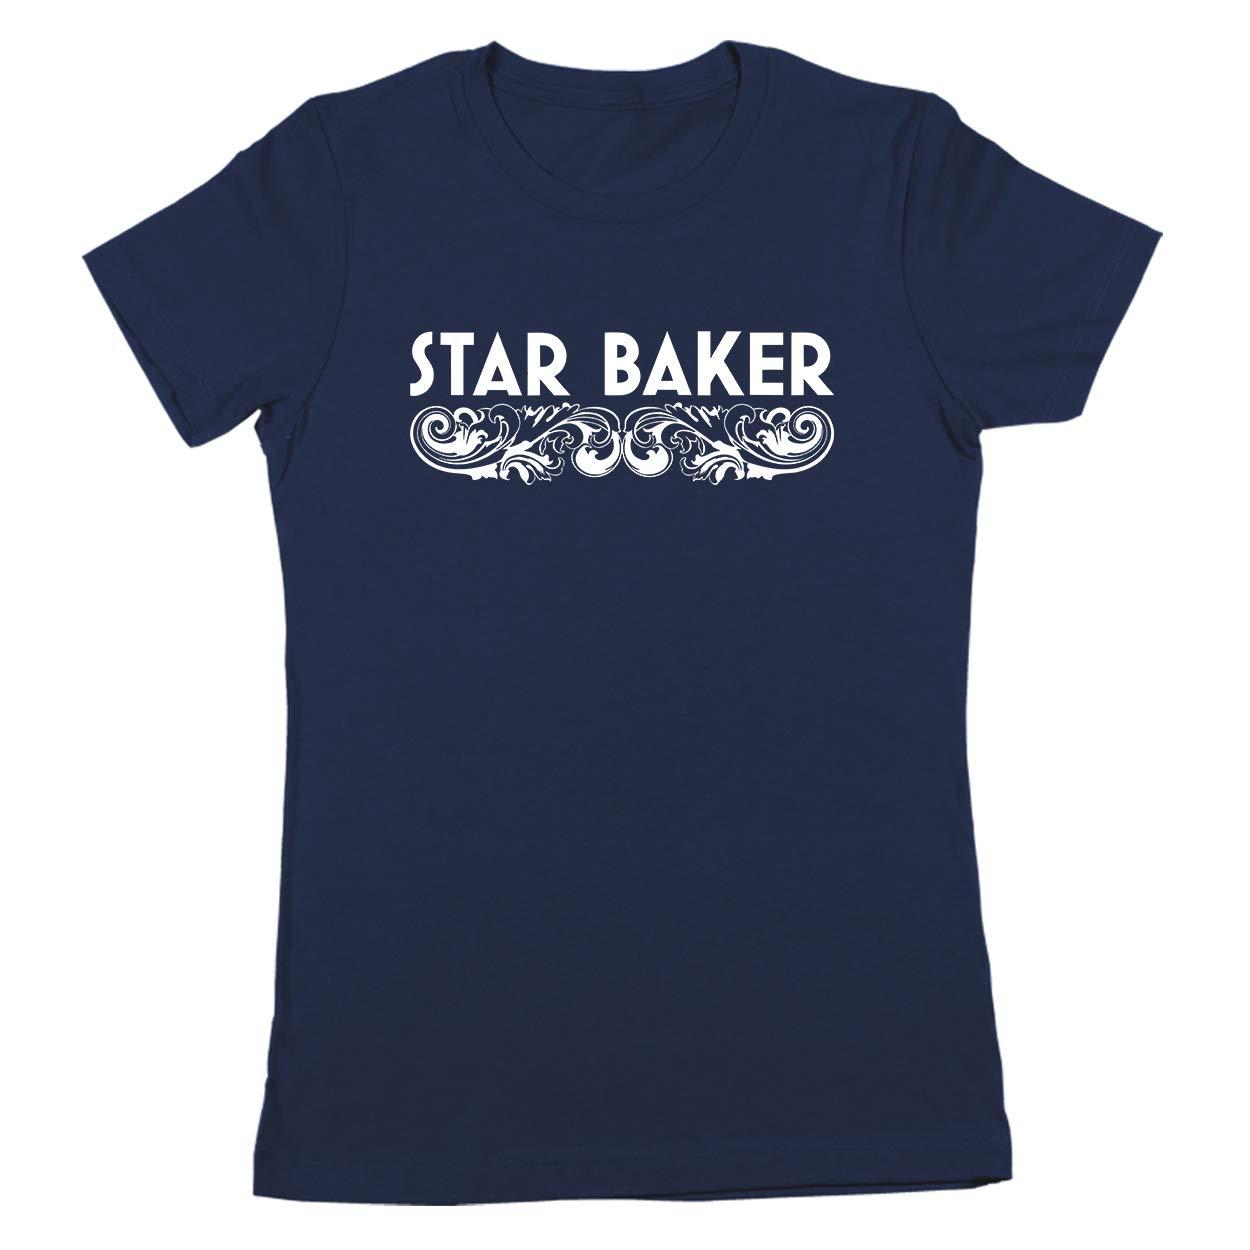 Star Baker Great American British Baking Pastry Chef Gbbo Shirt